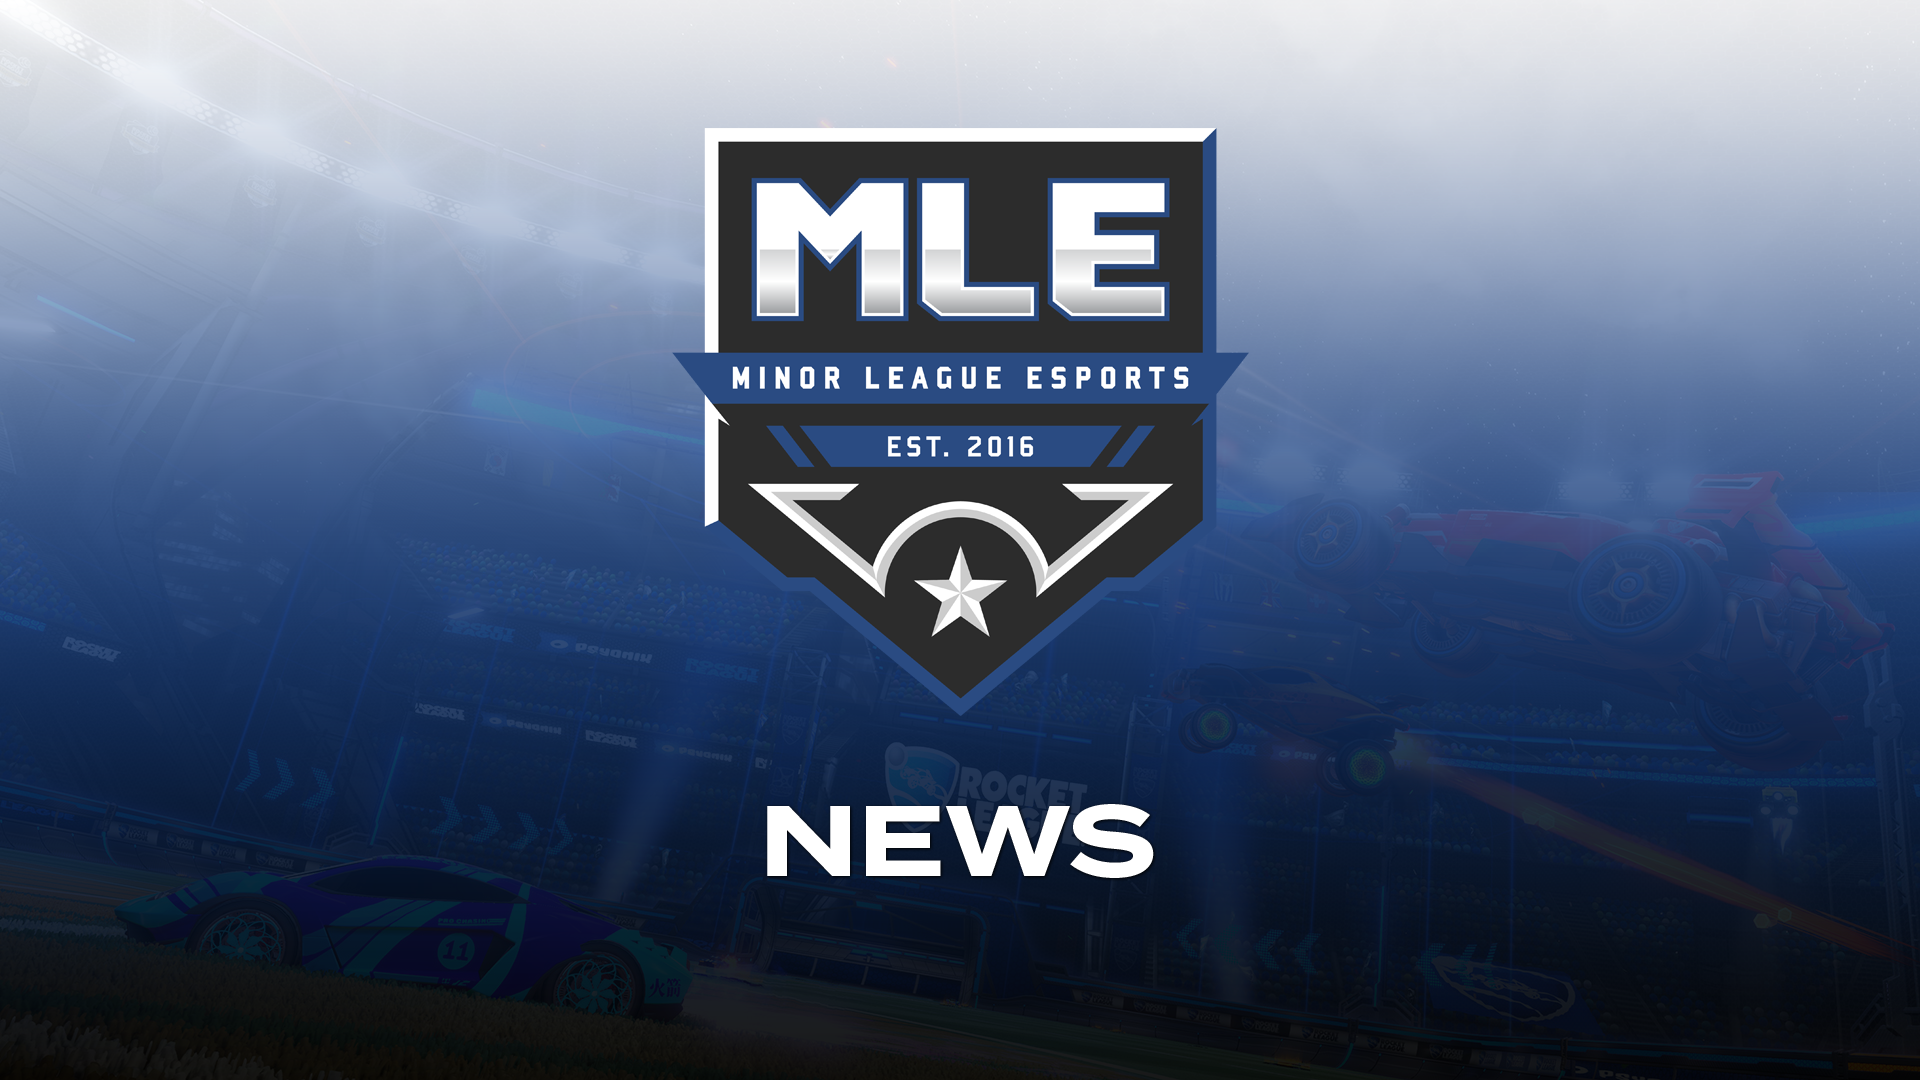 https://mlesports.gg/news/mle-news-update-draft-lottery-applications-more/